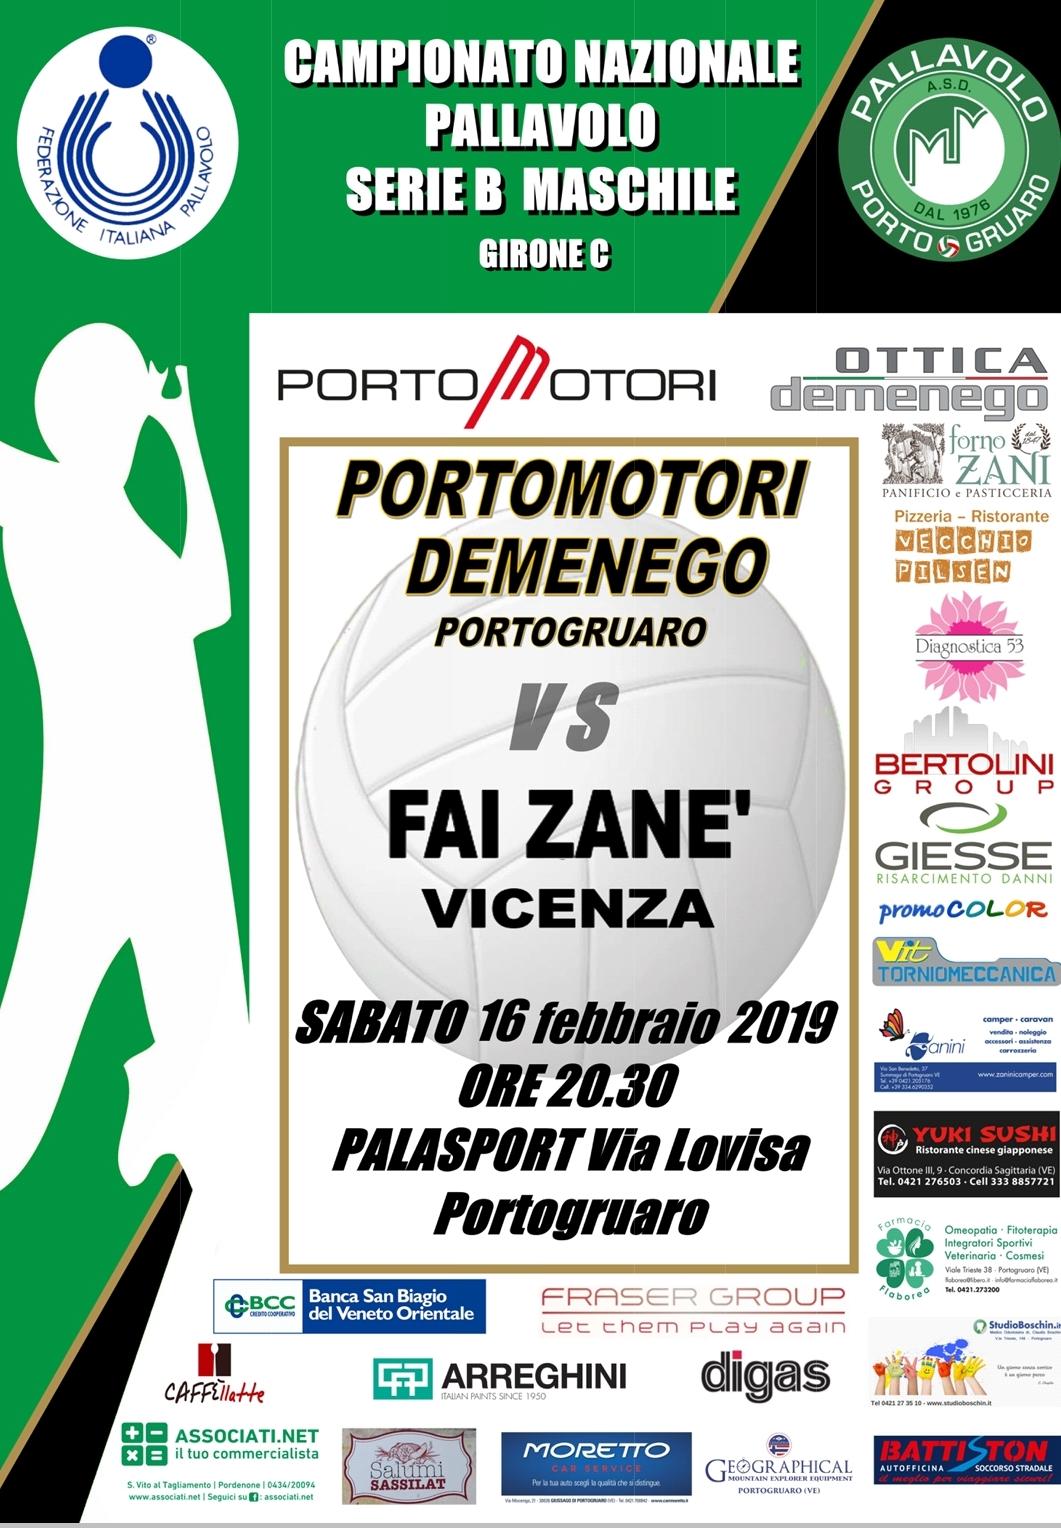 Fipav Venezia Calendario.Tag Archive For Portogruaro